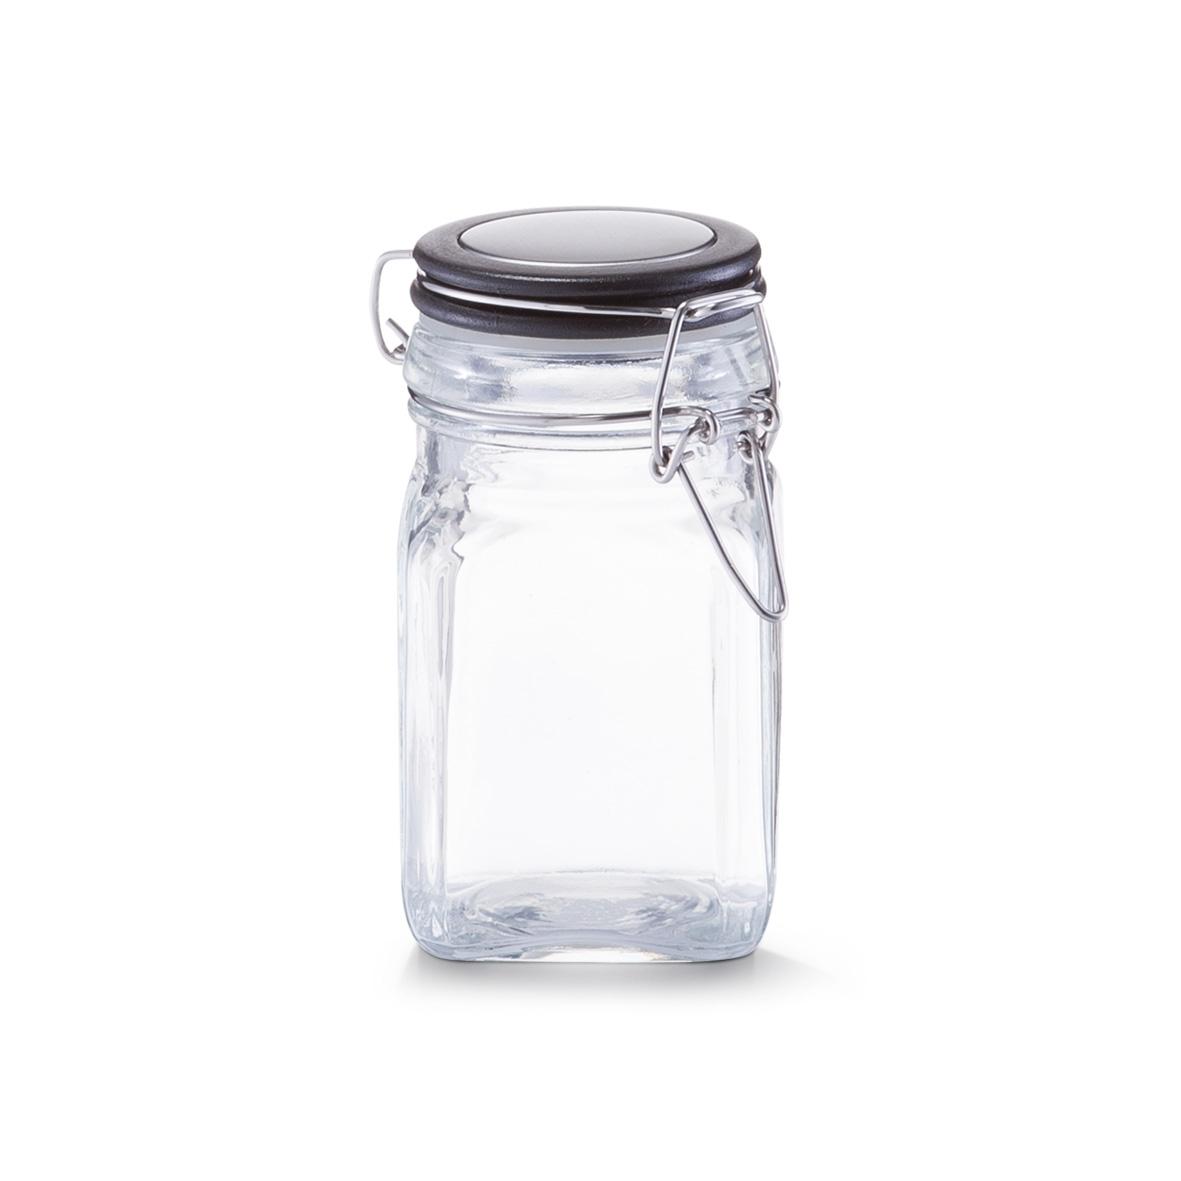 Borcan pentru depozitare cu capac, inchidere ermetica, 280 ml, l6,5xA6,5xH12 cm imagine